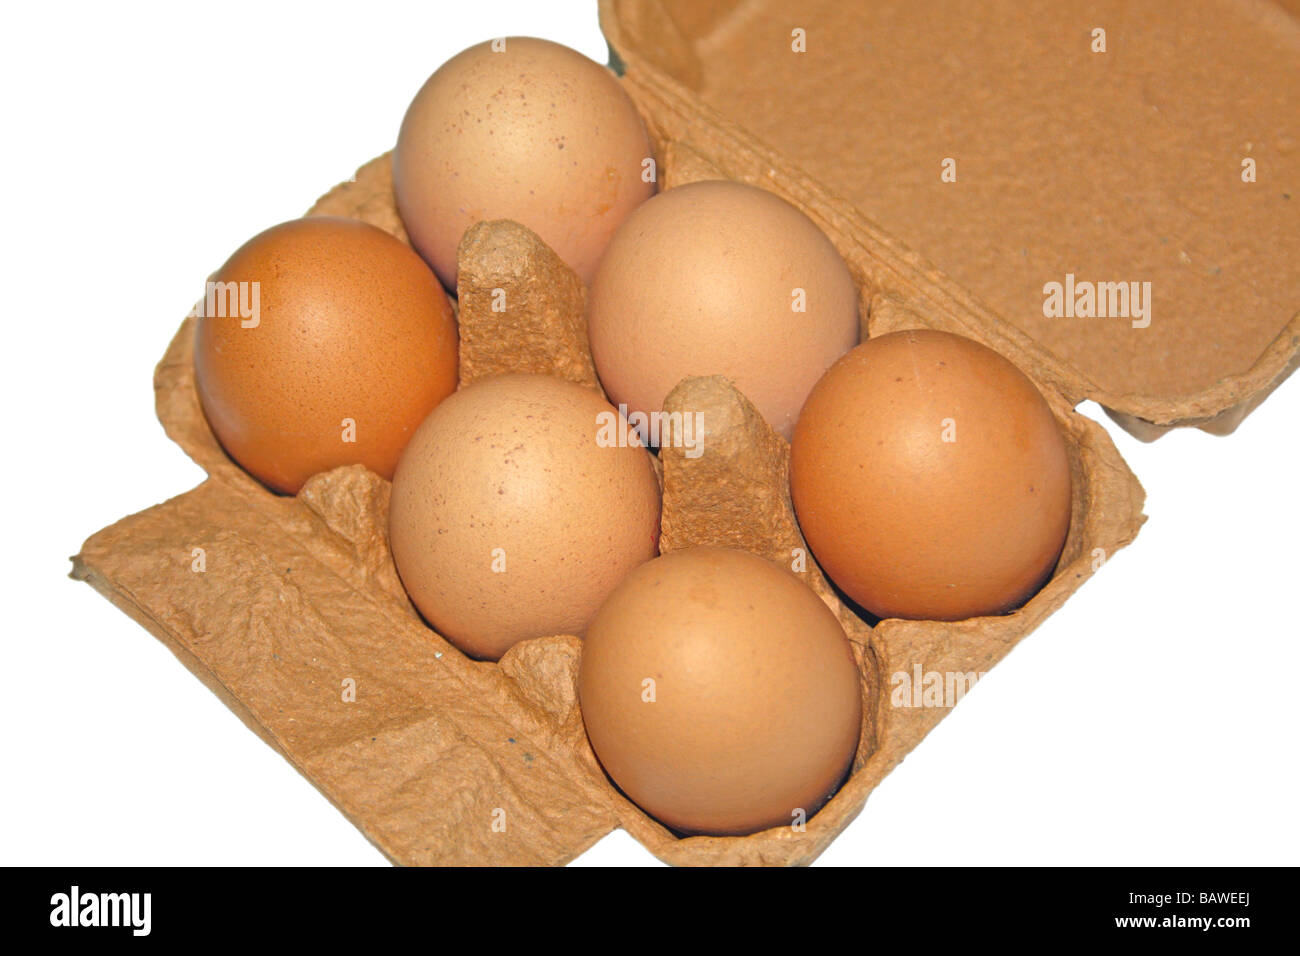 Eggs and carton - Stock Image